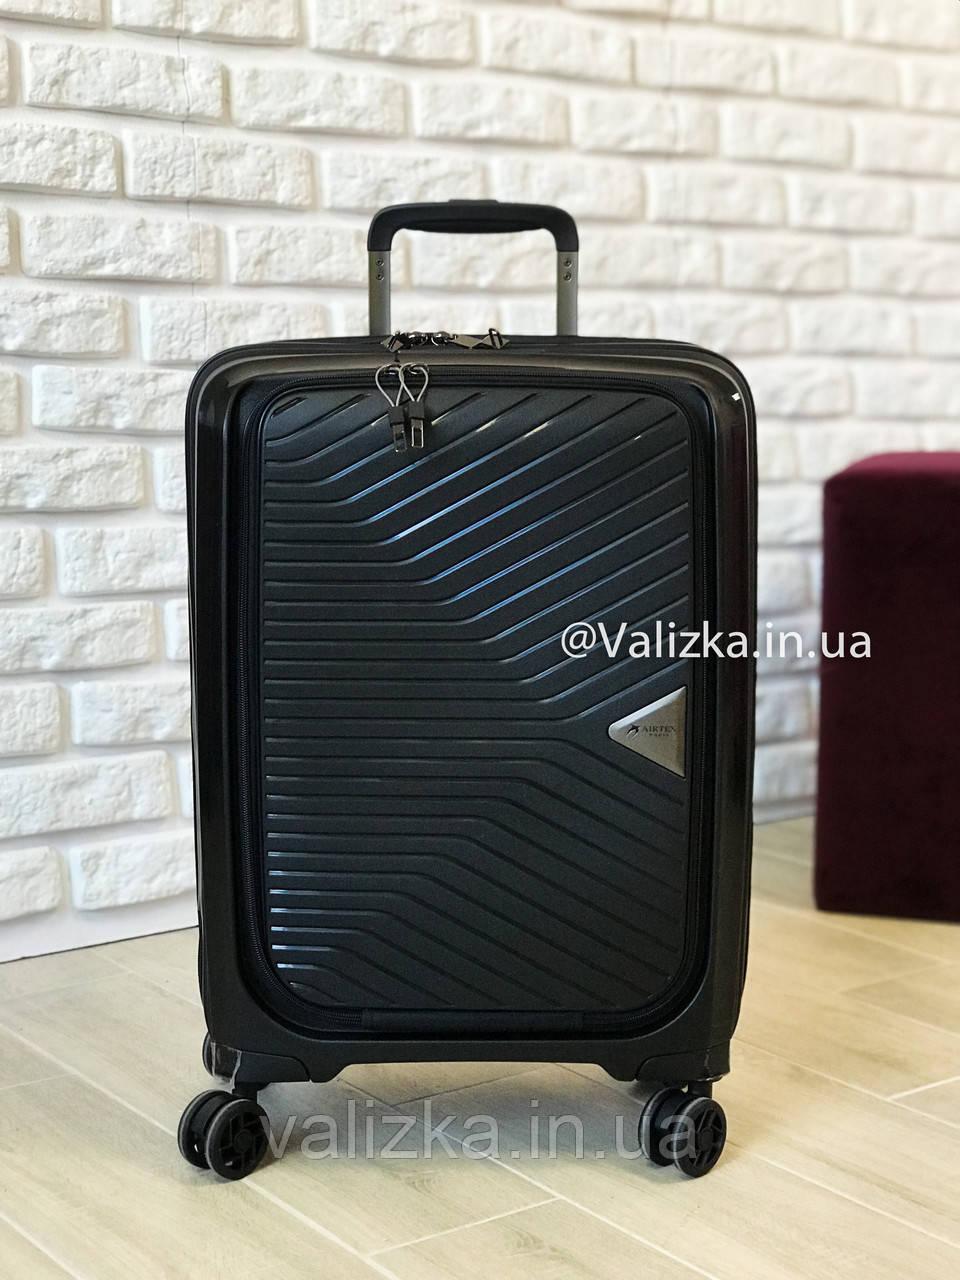 Чемодан из полипропилена пластиковый с отделением для ноутбука Airtex Франция / Якісна валіза з поліпропілену